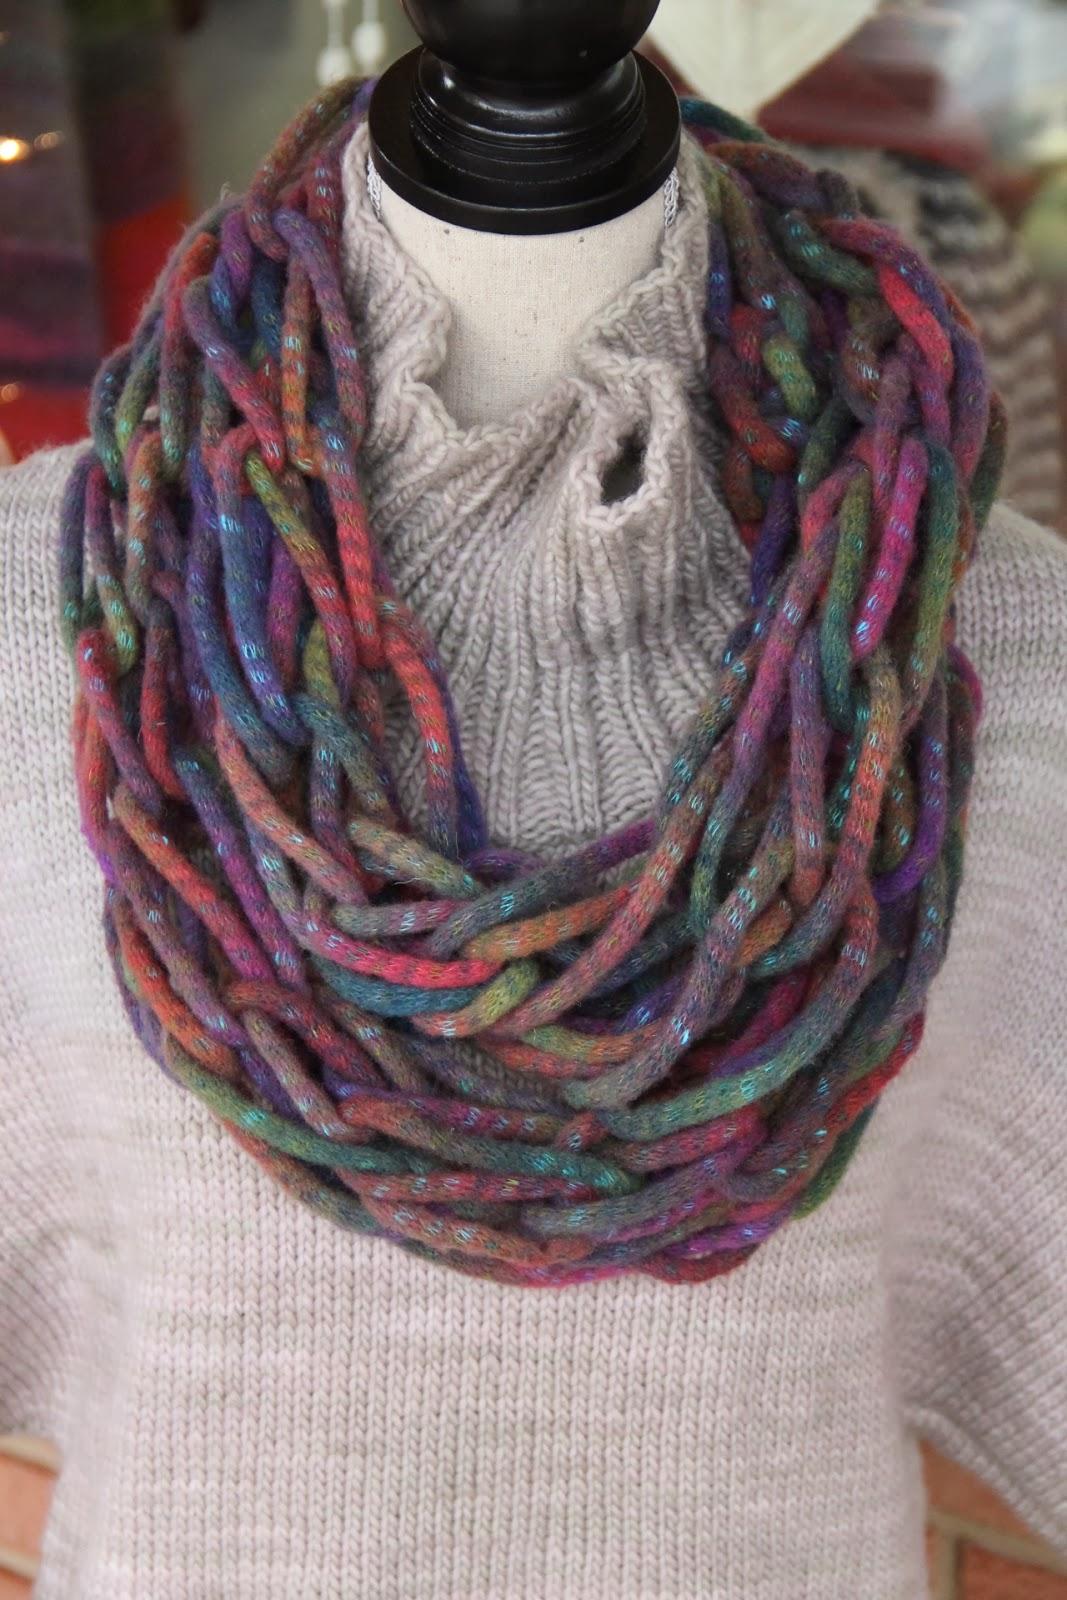 Arm Knitting Yarn : Chelsea yarns arm knitting at